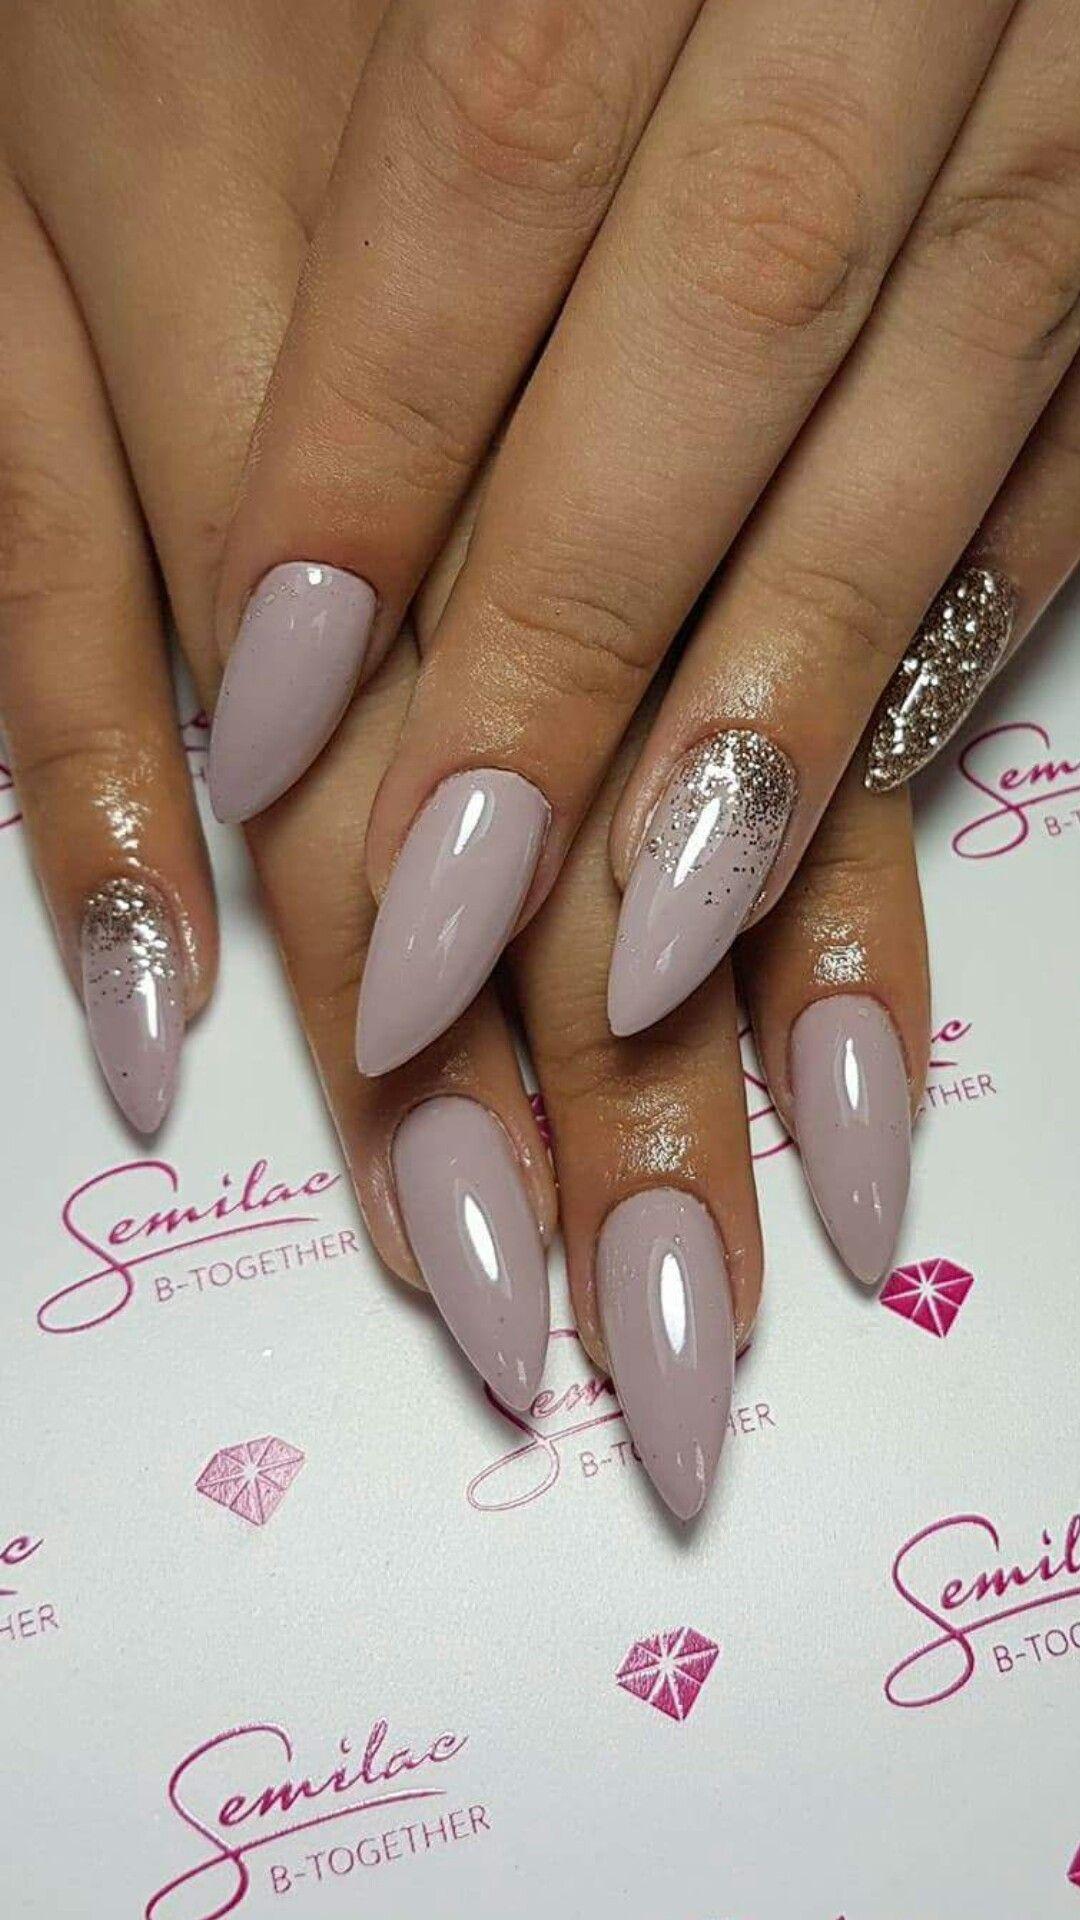 Winter Nails Glitternailart Classynails Stiletto Ooooo Pretty